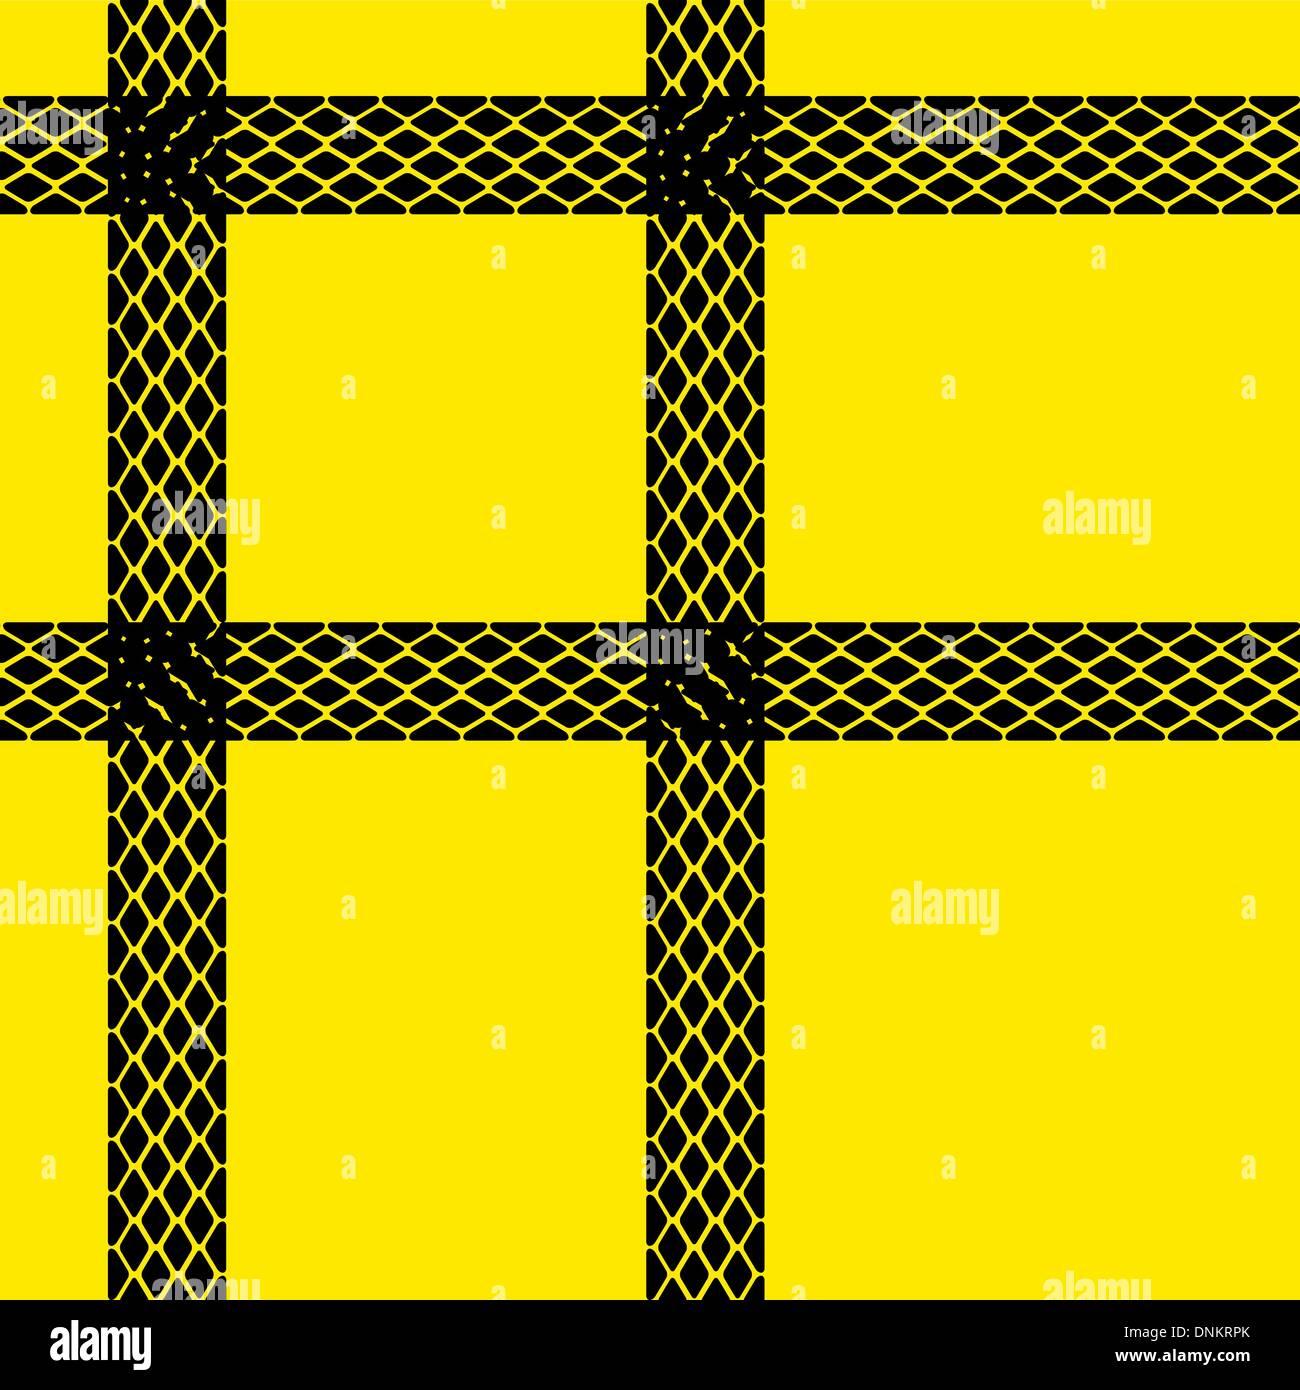 Nahtlose Tapete Reifen Spuren Muster Illustration Vektor Hintergrund Stock Vektor